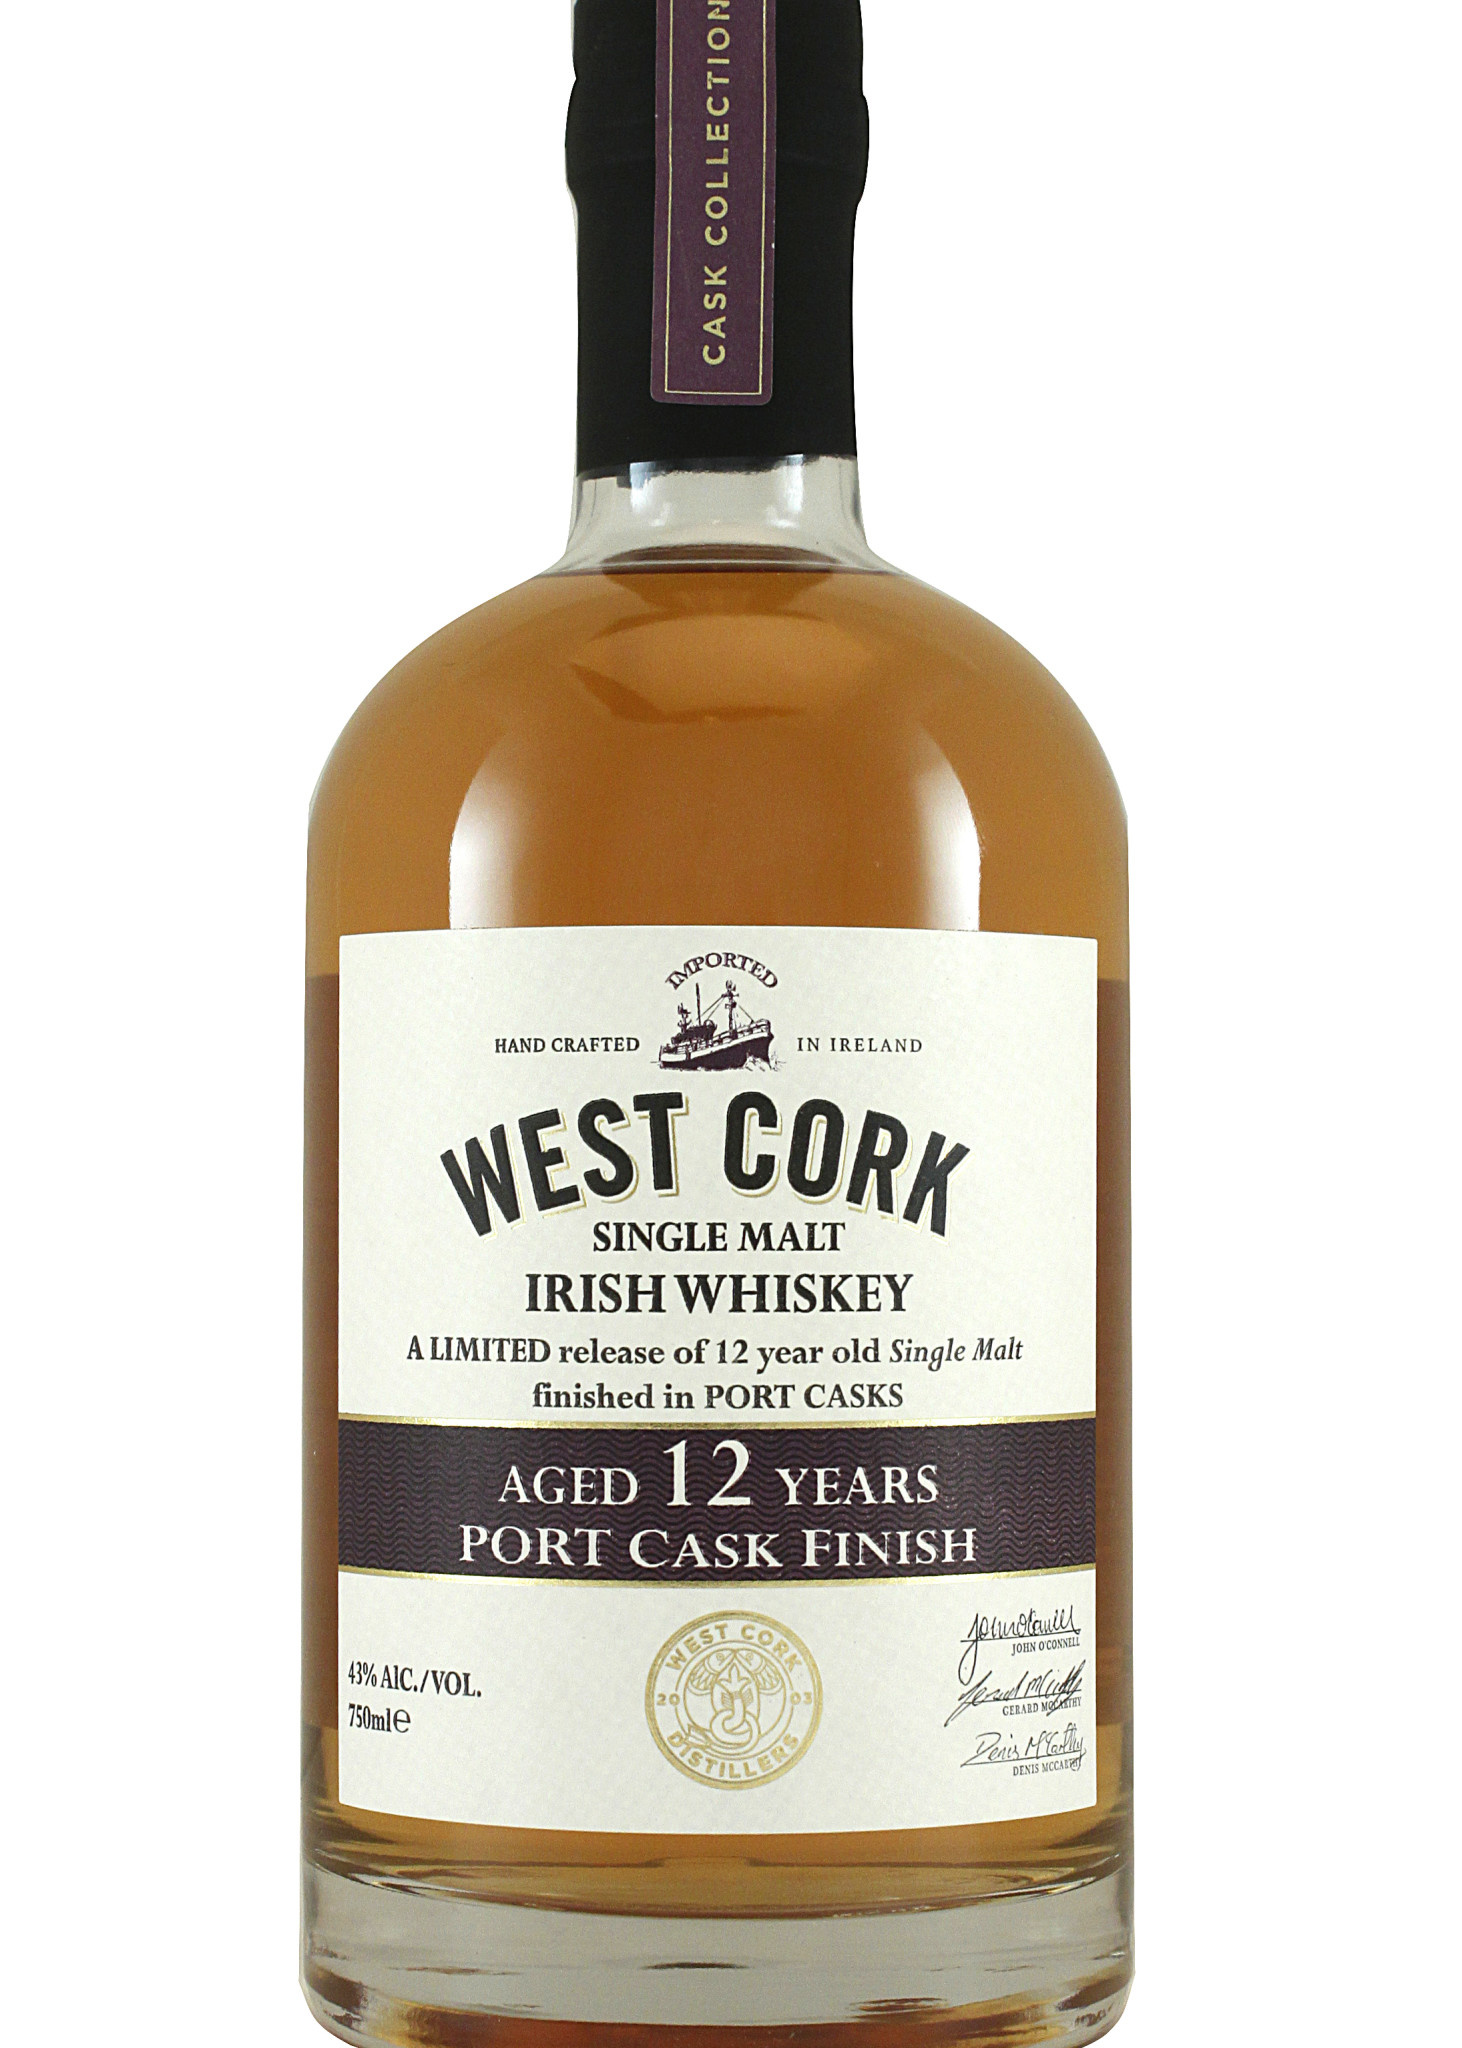 West Cork Single Malt Irish Whiskey Aged 12 Years